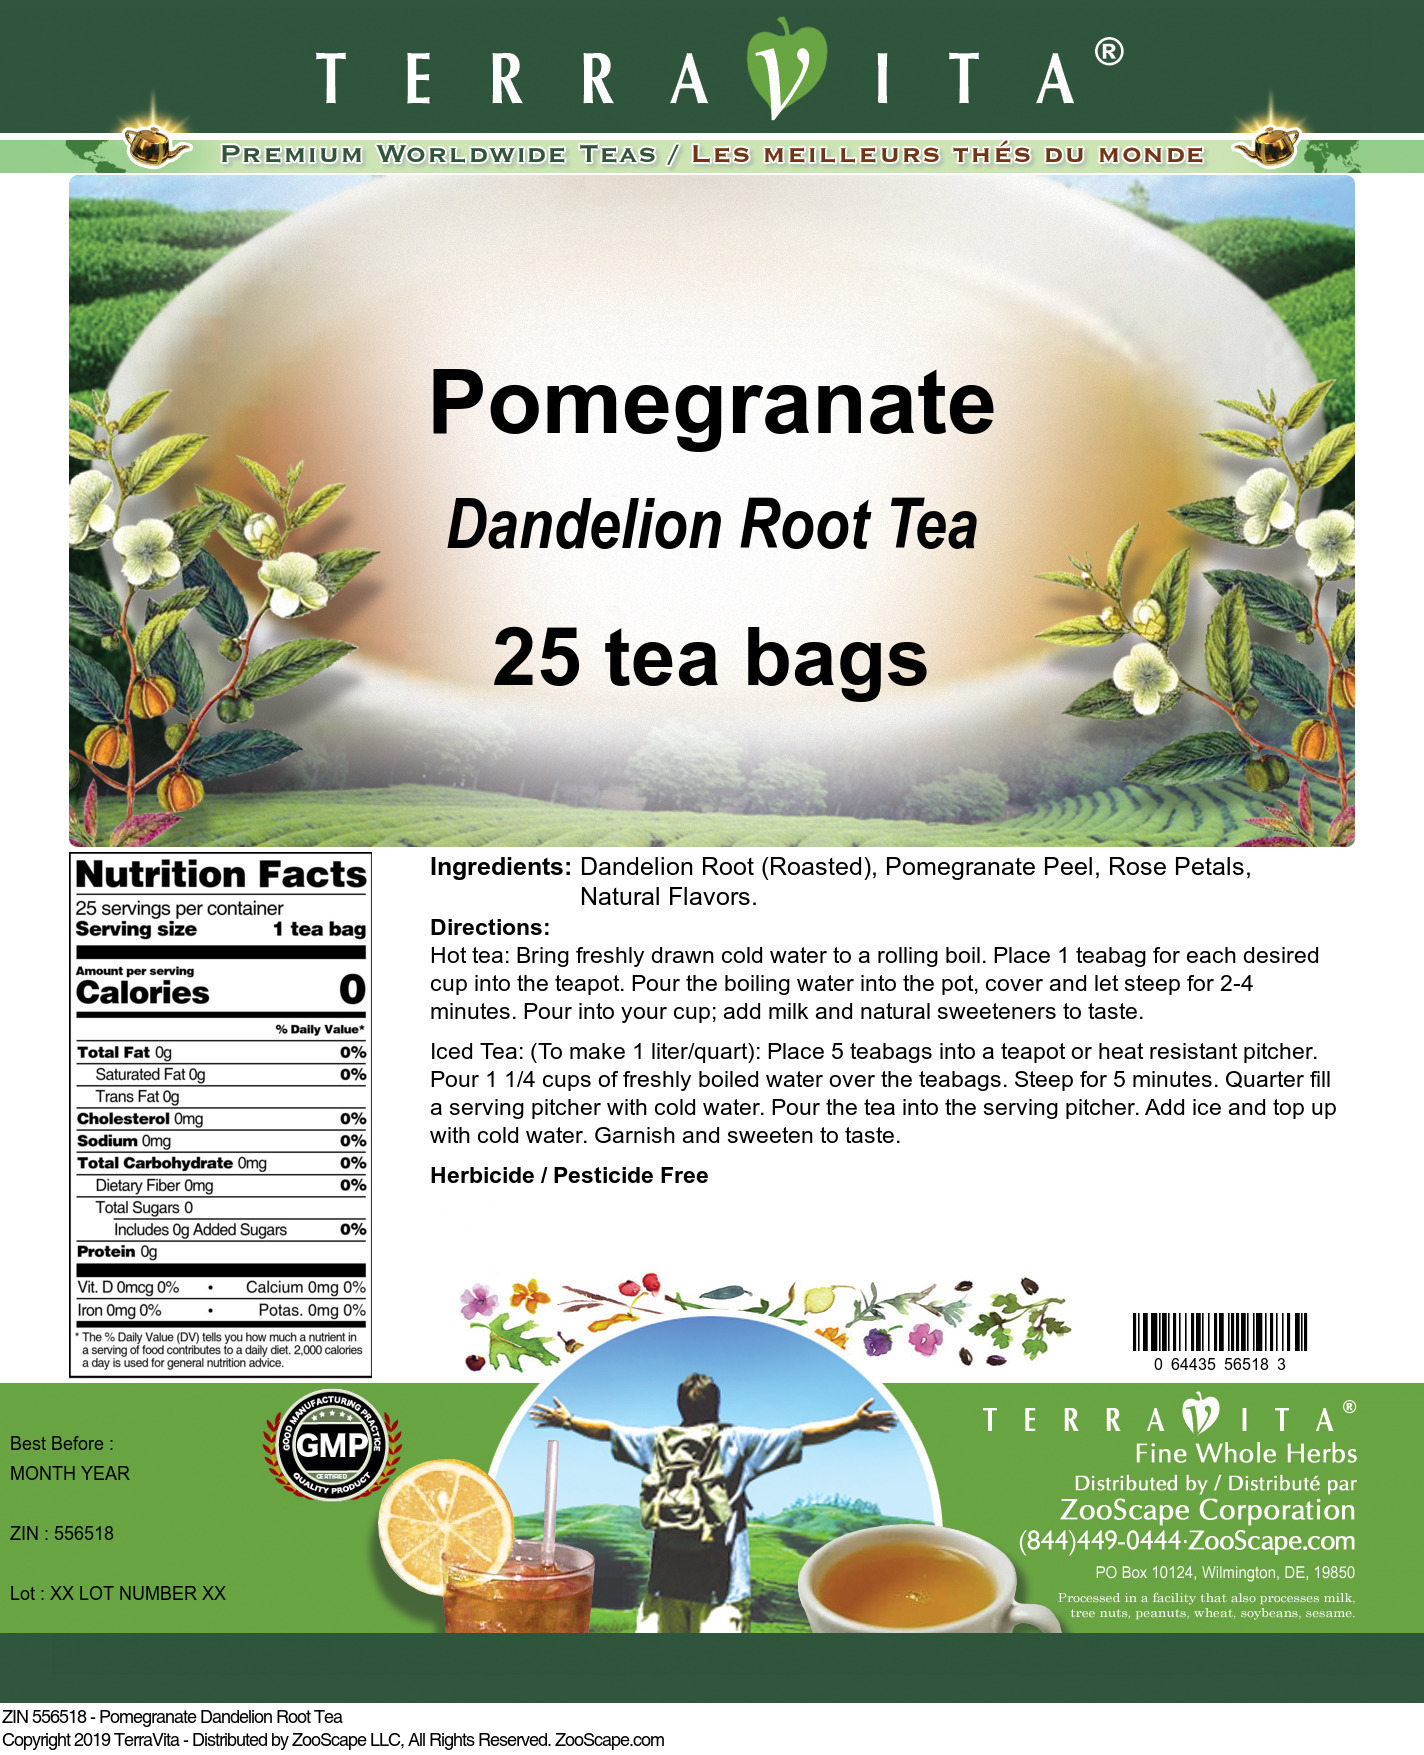 Pomegranate Dandelion Root Tea